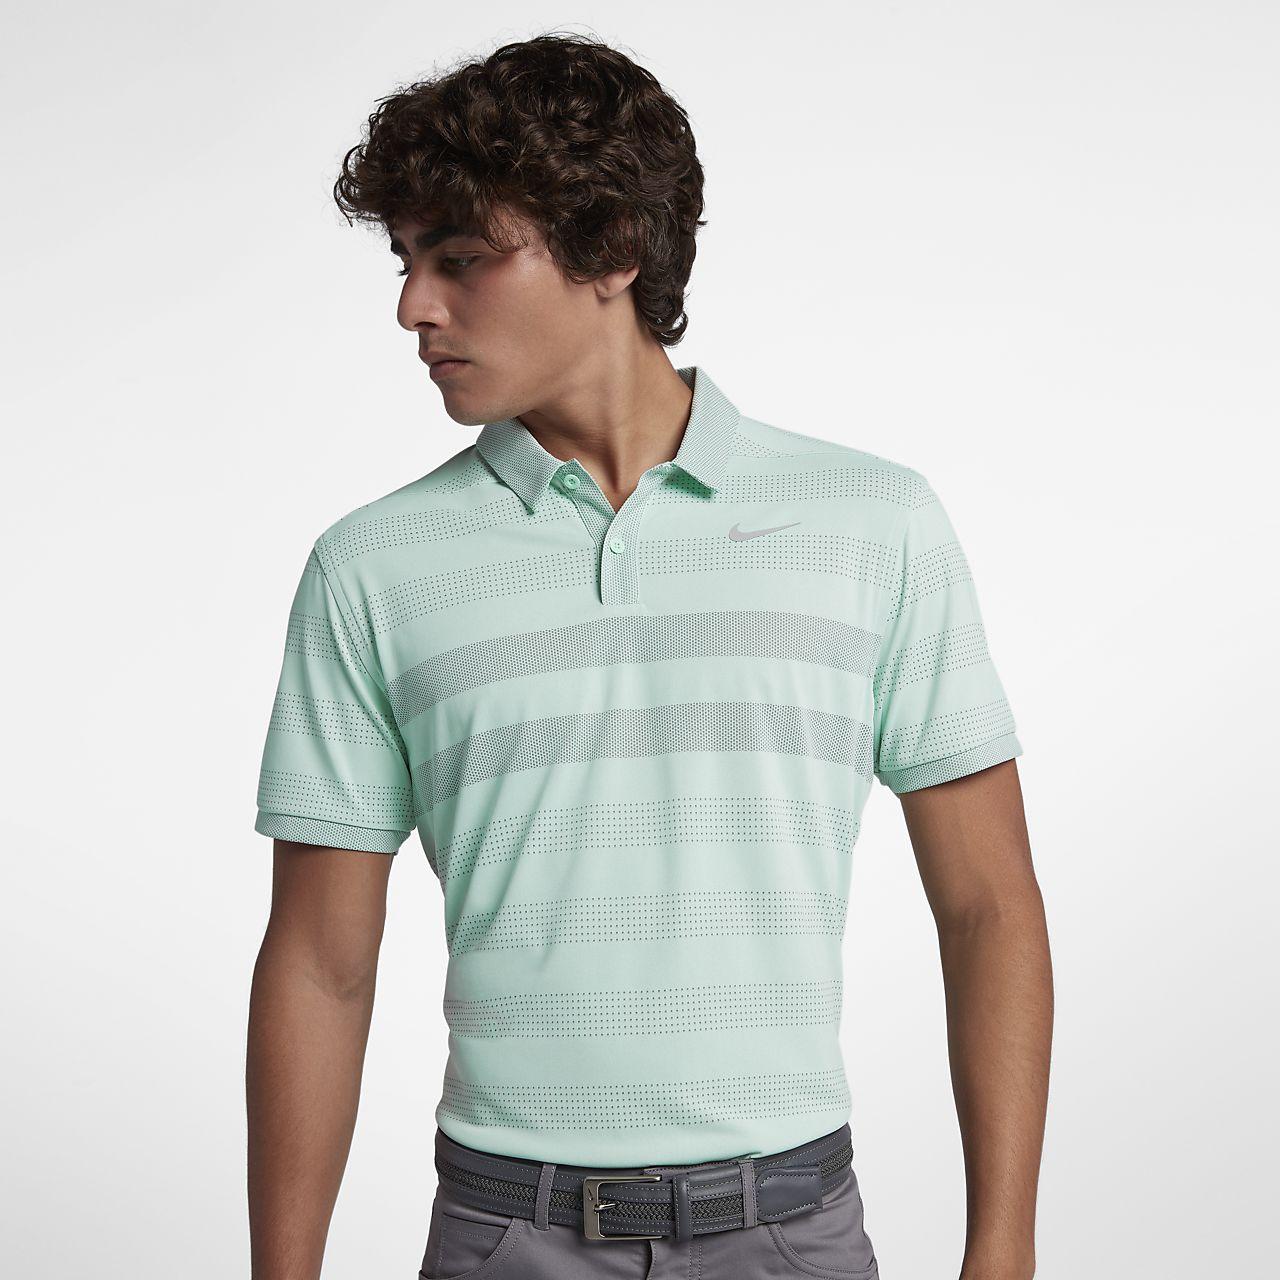 Nike Zonal Cooling gestreiftes Herren-Golf-Poloshirt